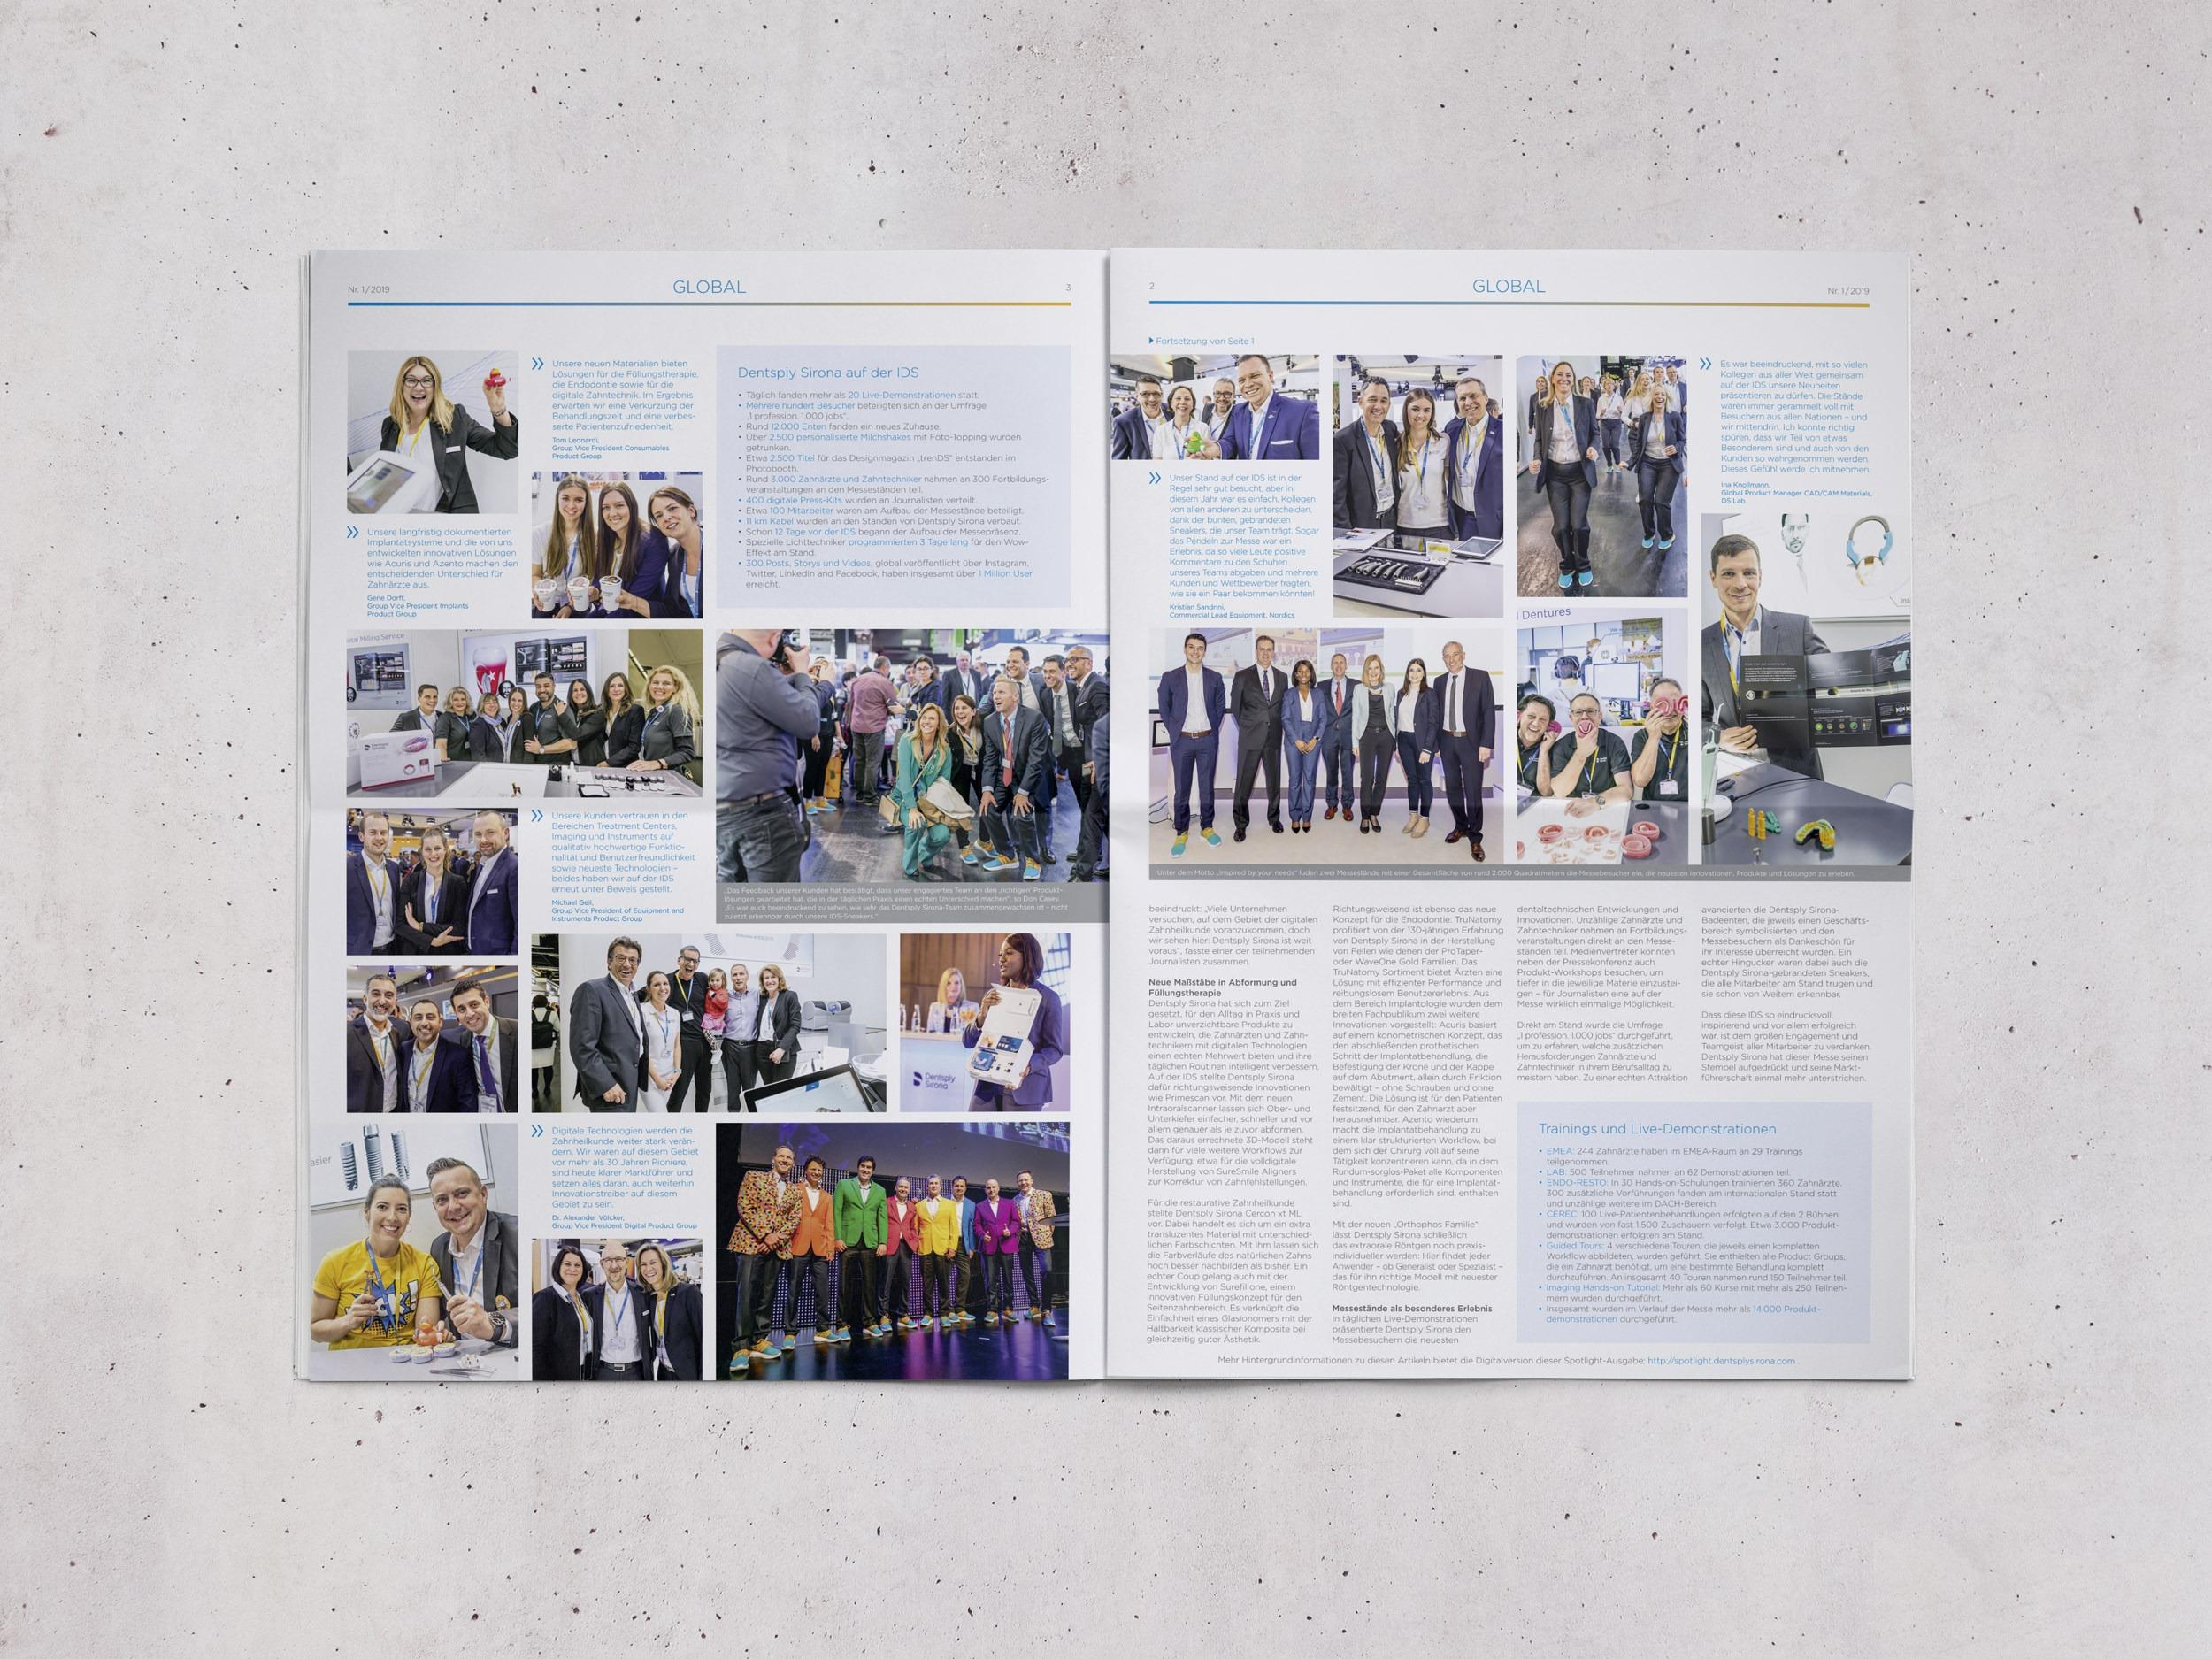 Dentsply Sirona – Magazin Spotlight, Global-Ausgabe | Editorial Design, Corporate Publishing